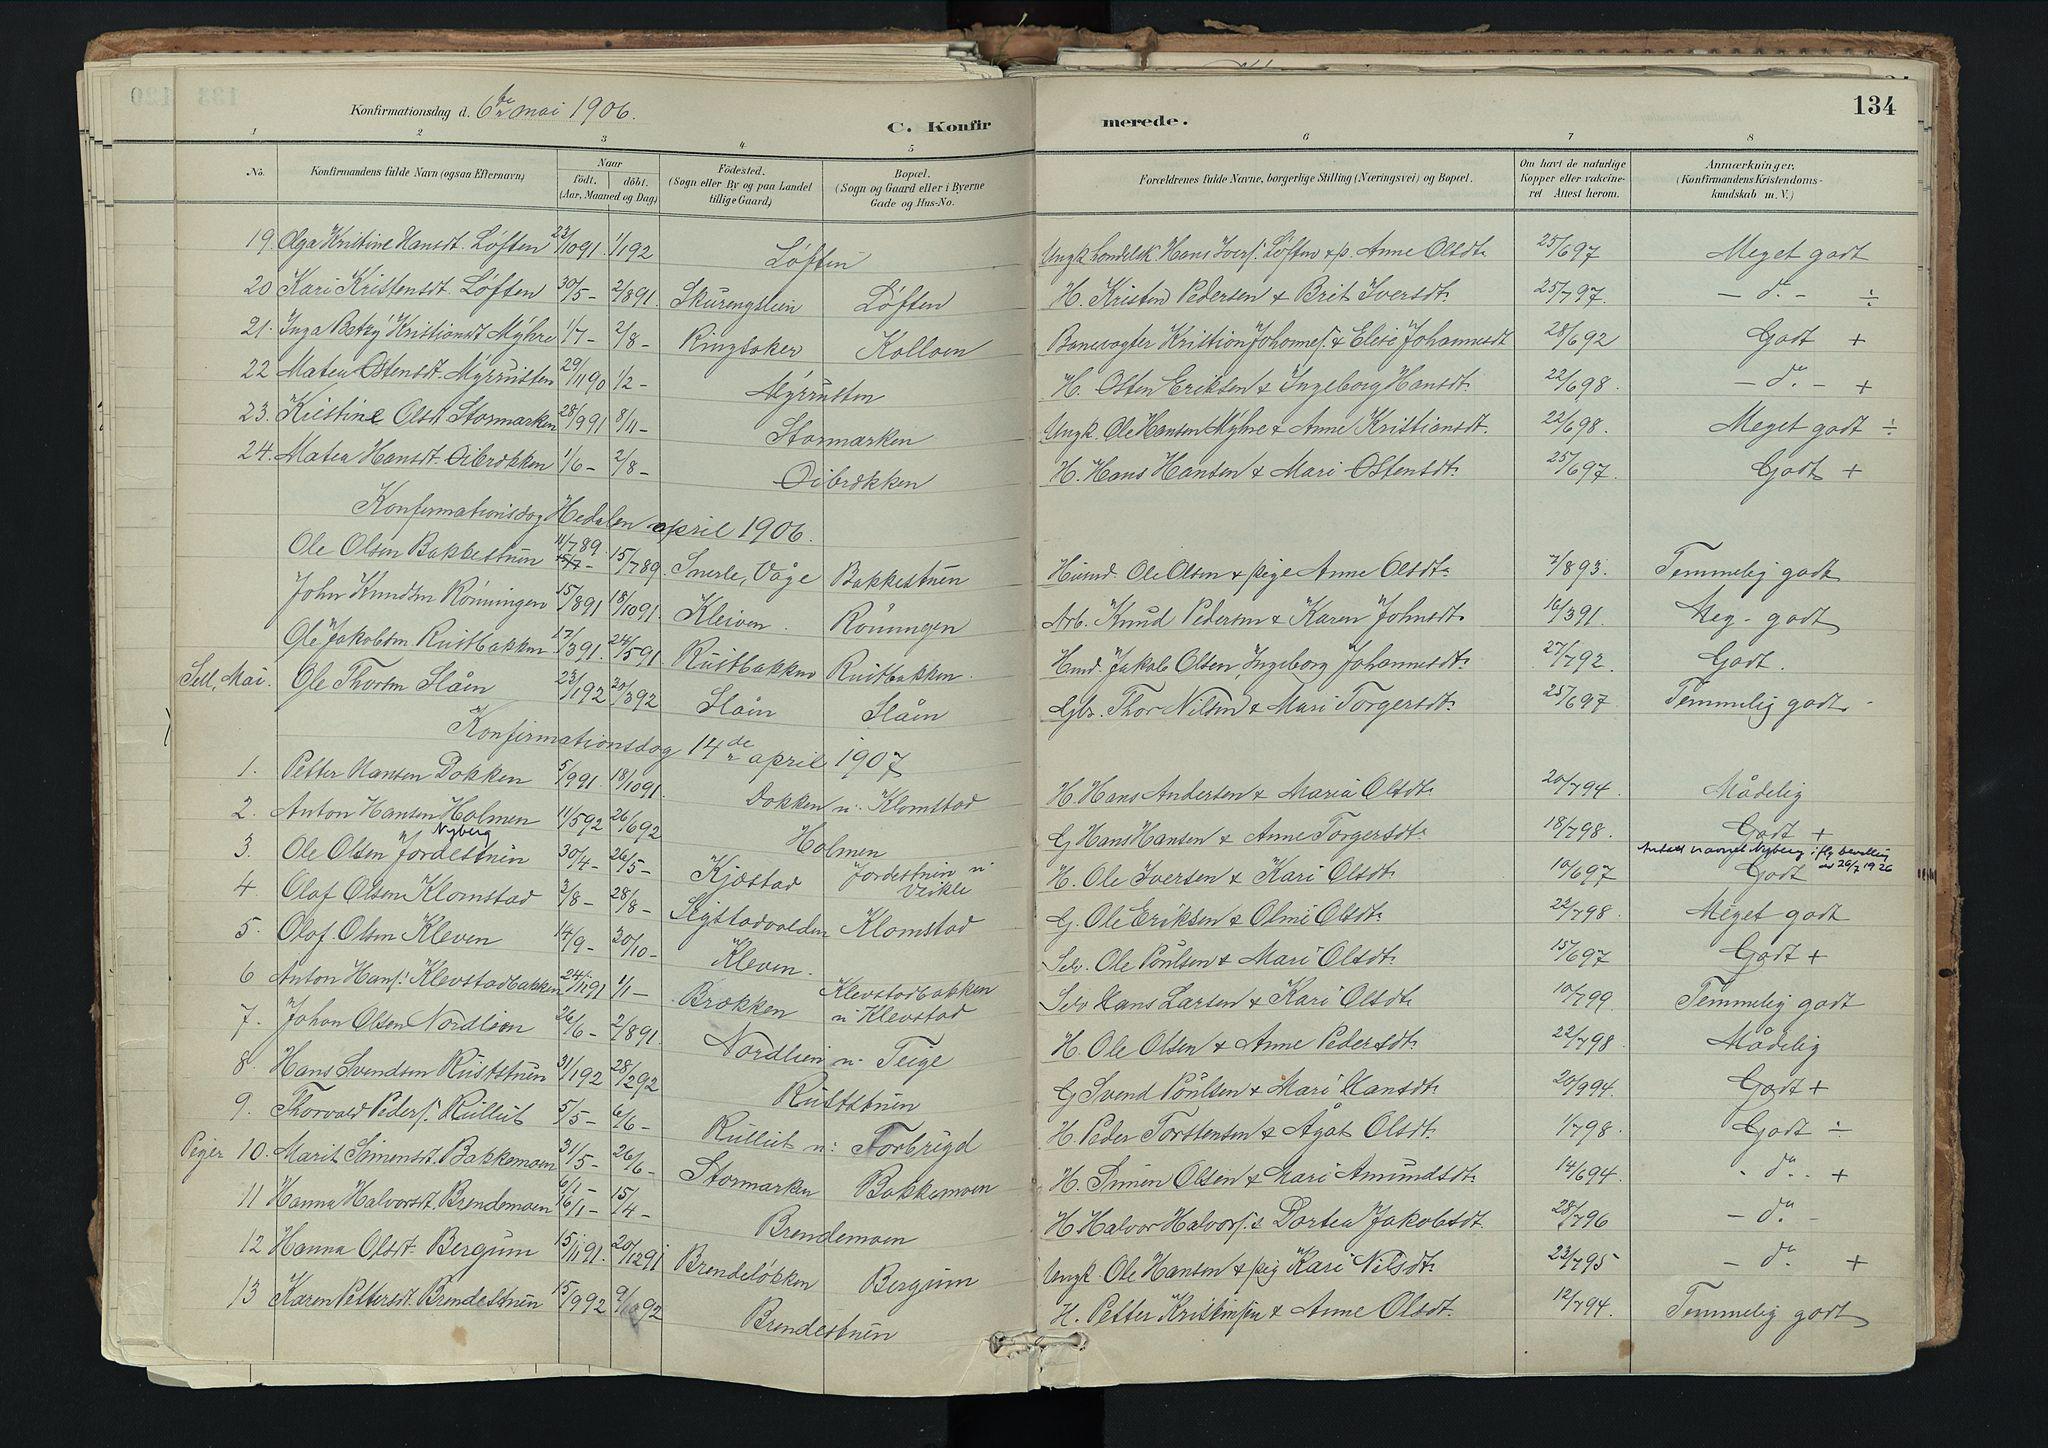 SAH, Nord-Fron prestekontor, Ministerialbok nr. 3, 1884-1914, s. 134